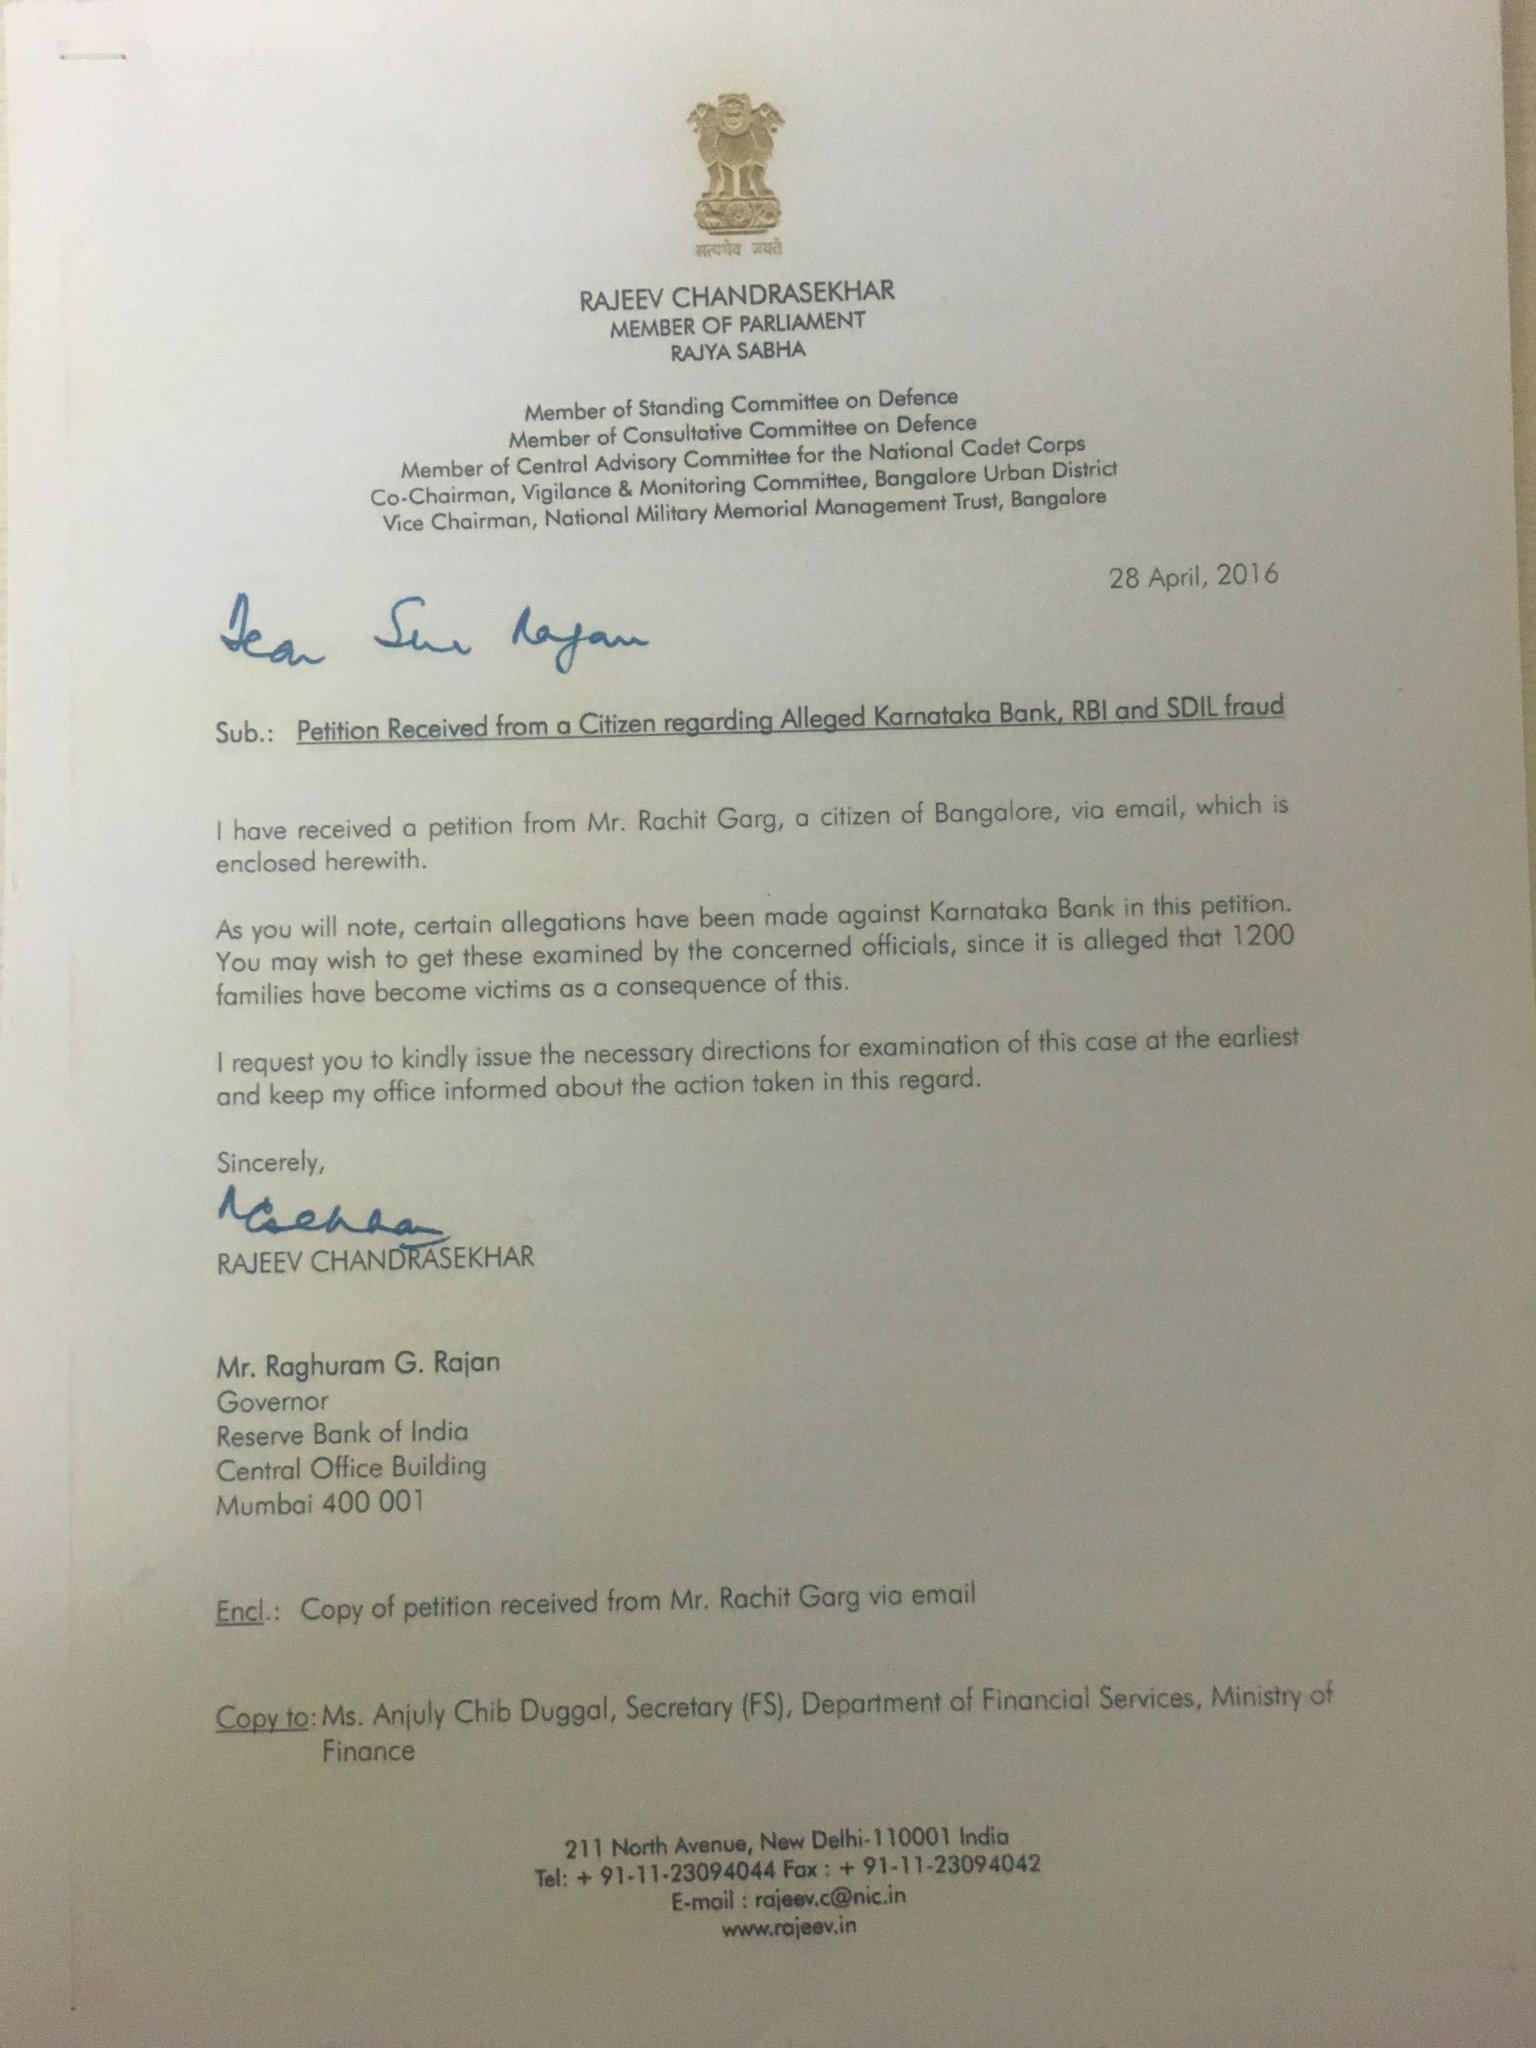 Rajeev Chandrasekhar On Twitter In April I Wrote To Rbi Gov Aftr